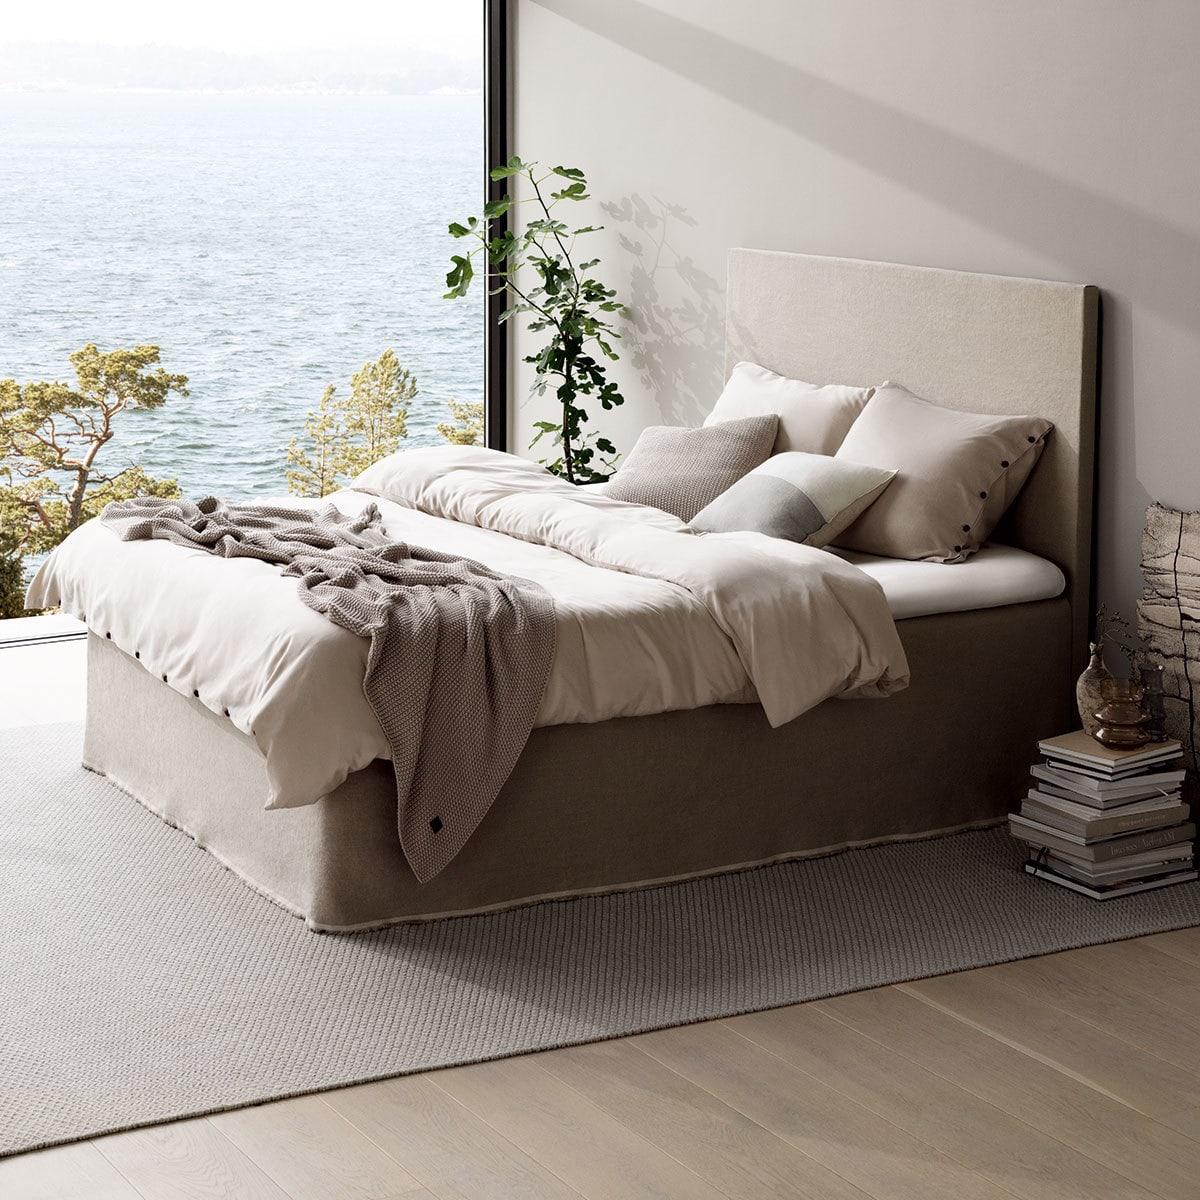 marc o polo tencel bettw sche vora oatmeal g nstig online kaufen bei bettwaren shop. Black Bedroom Furniture Sets. Home Design Ideas